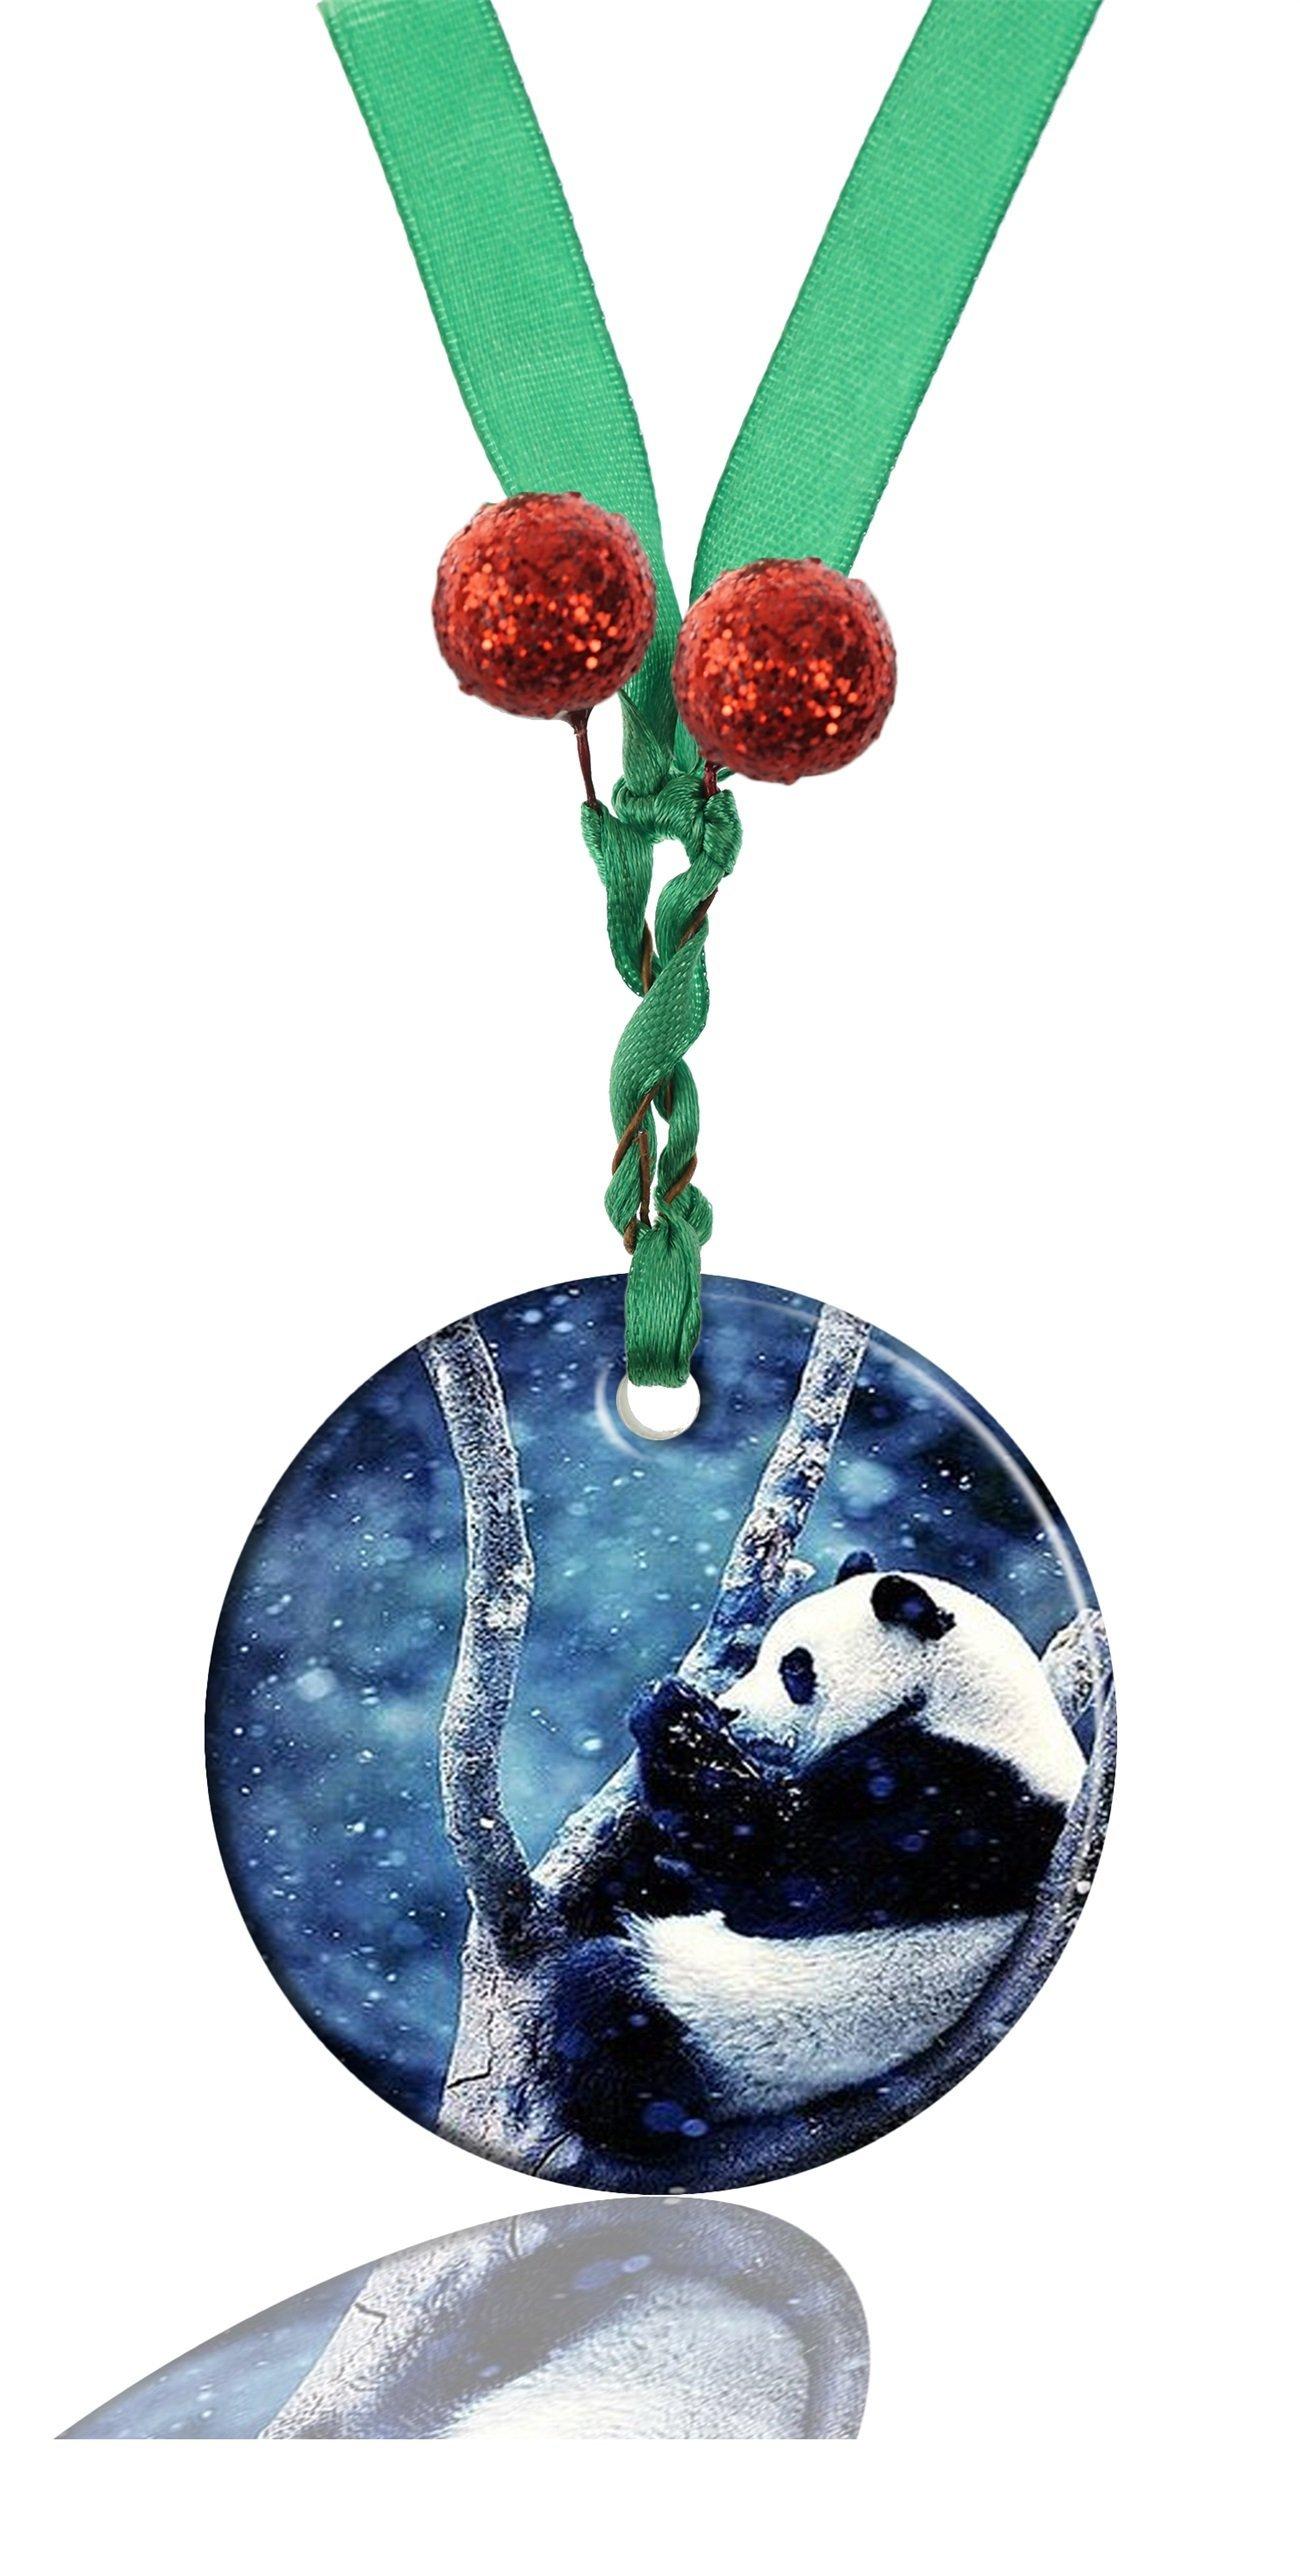 RUNDO Animal Panda Custom Personalized New Ceramic Porcelain Hanging Round Christmas Ornaments